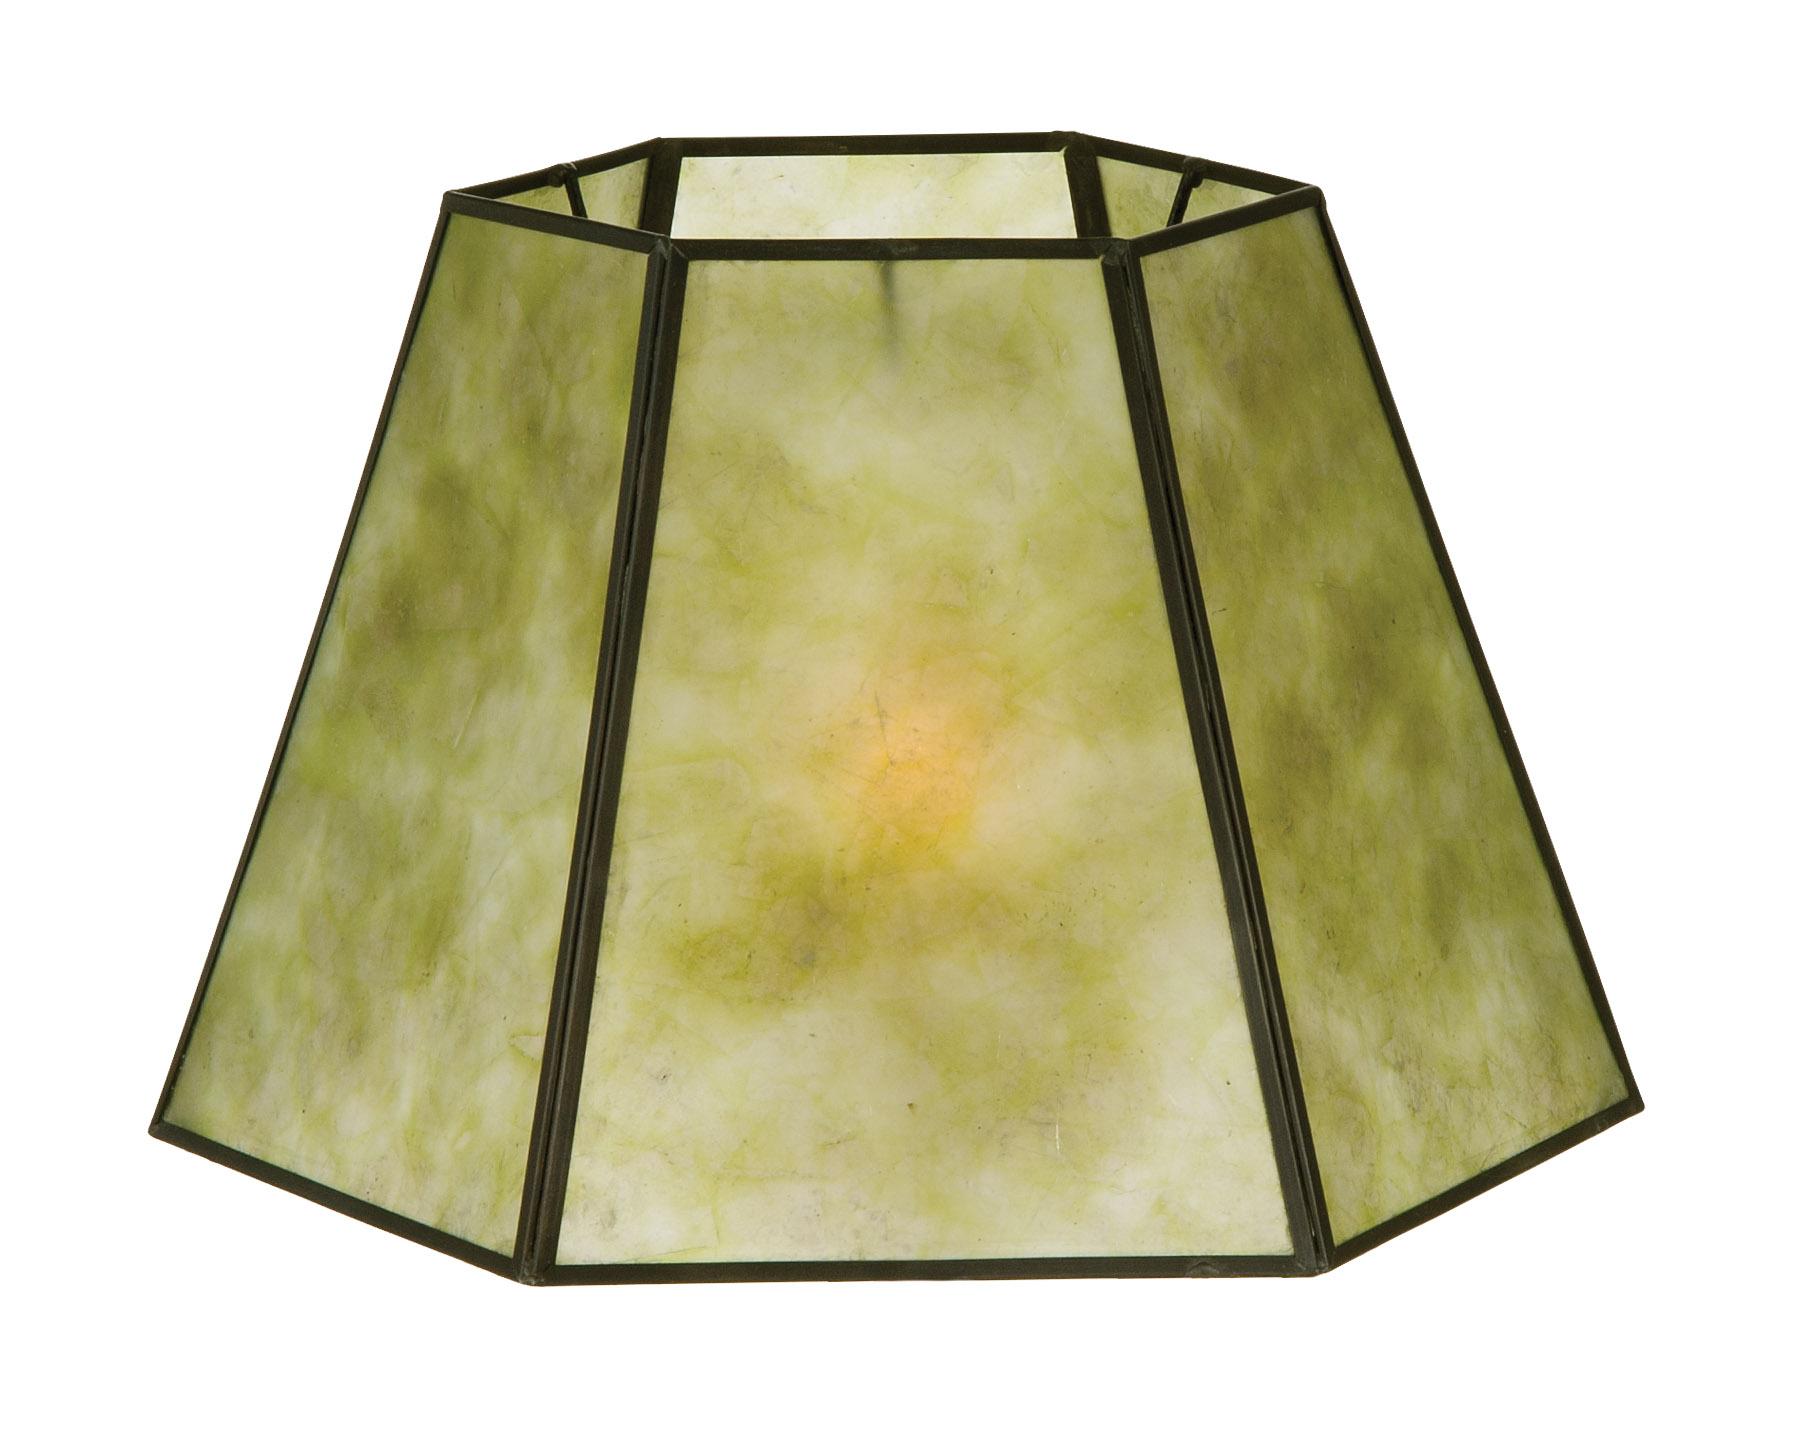 Craftsman Green Hexagon Style Mica Lampshade 05702g B Amp P